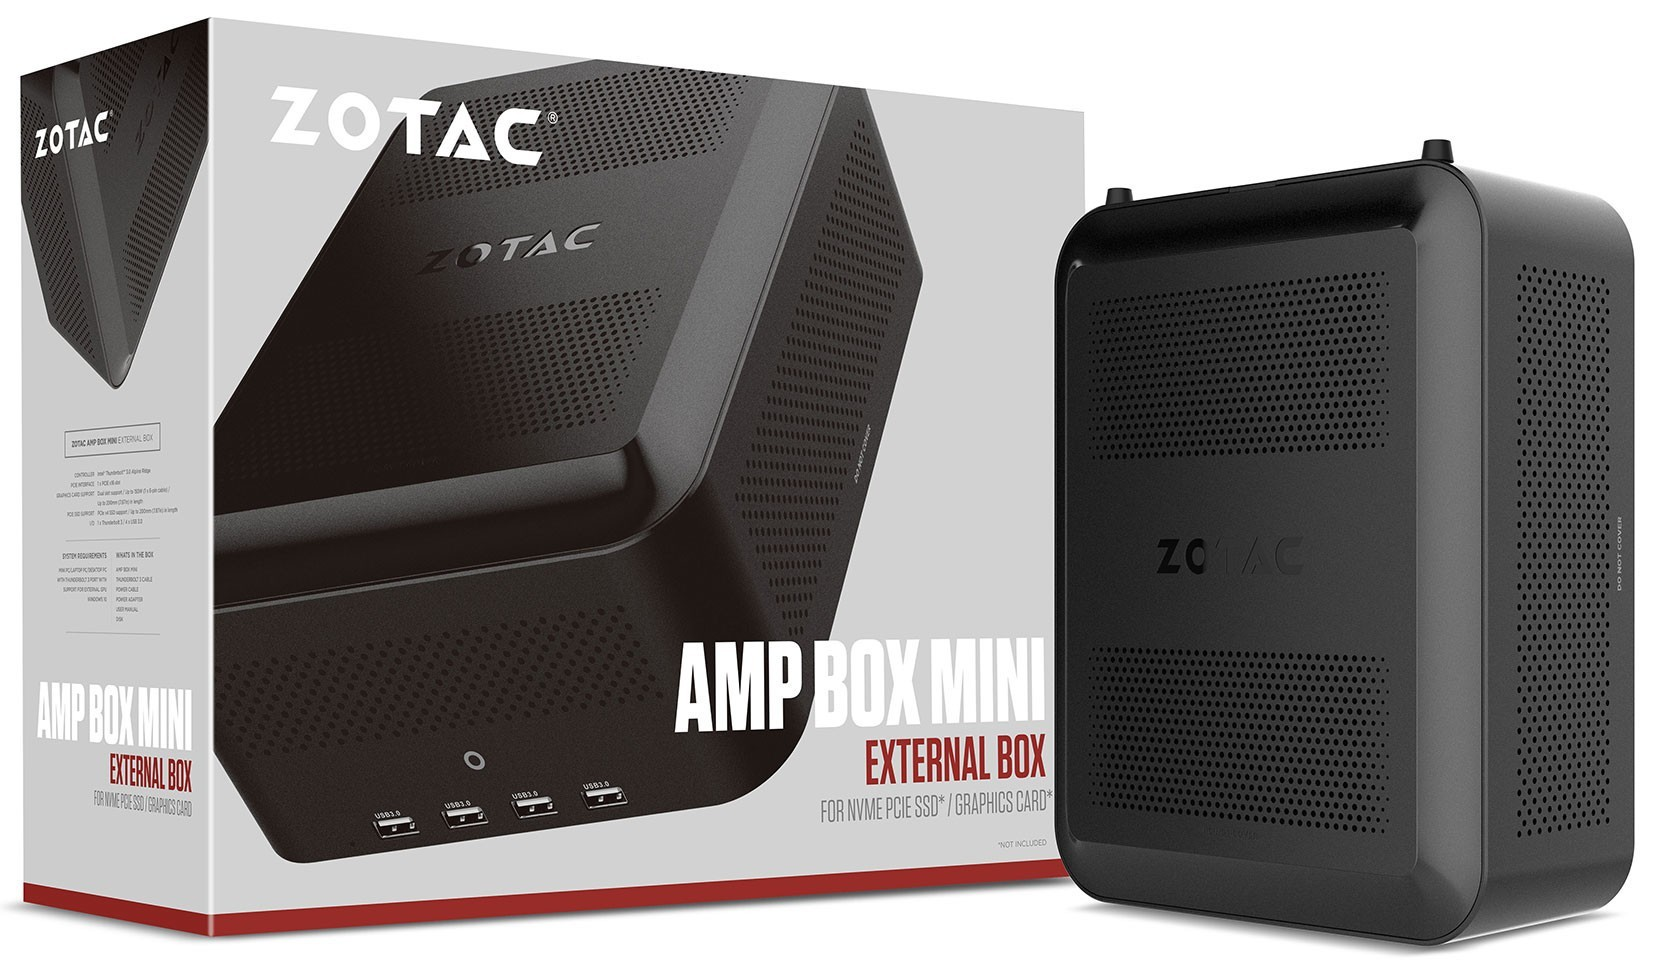 Amp Box mini